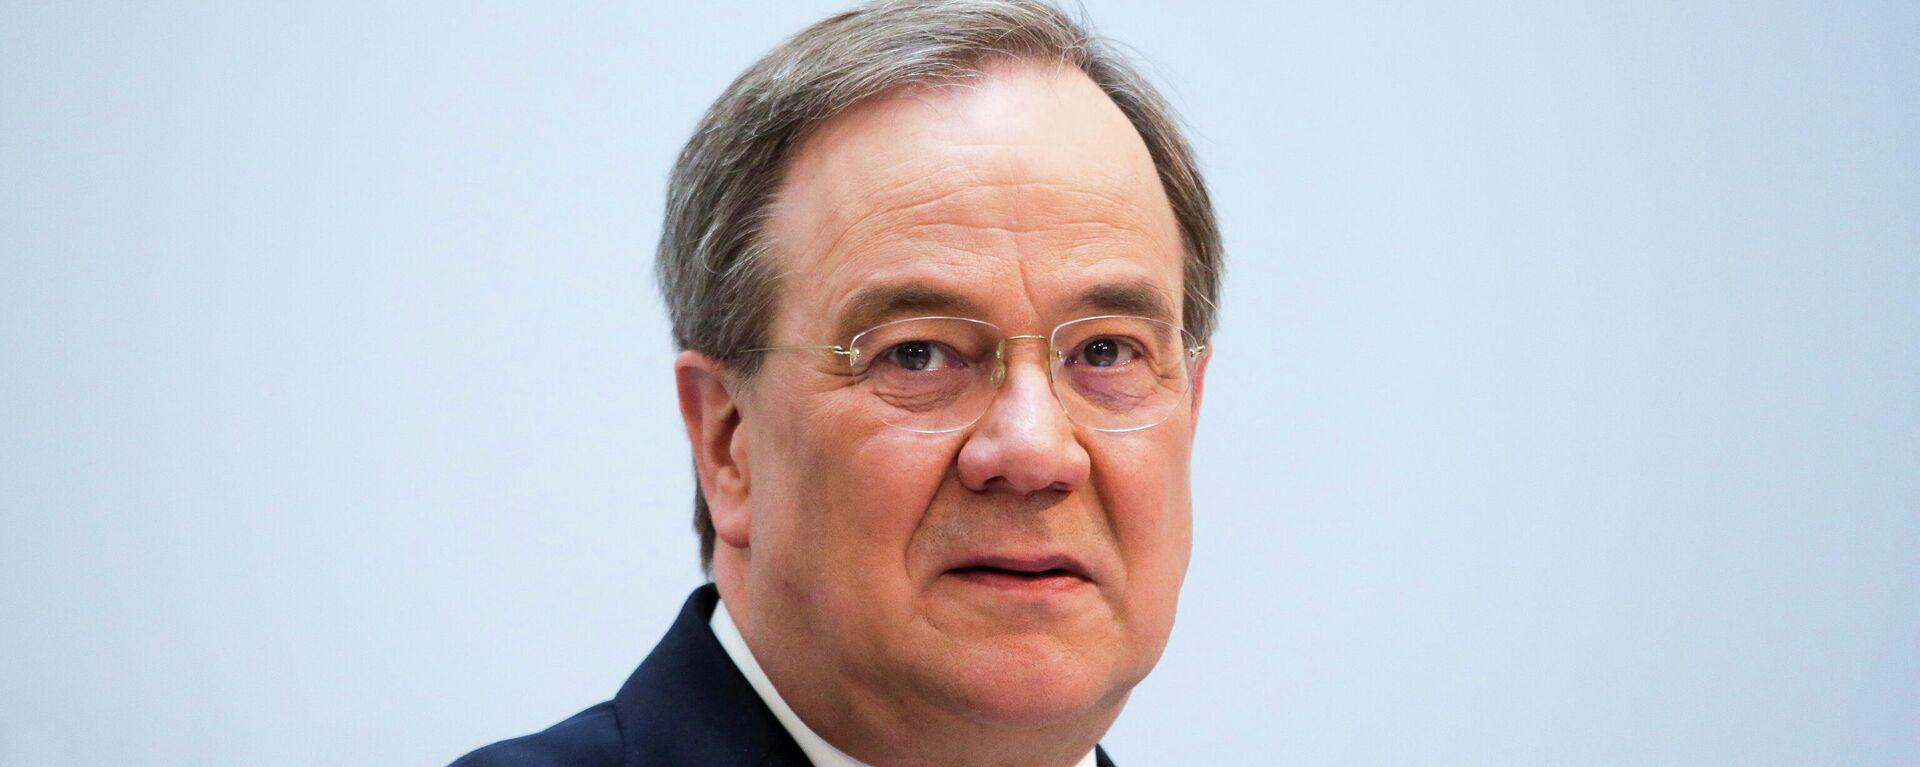 Armin Laschet, seit dem 22. Januar 2021 der neunte Bundesvorsitzende der CDU seit ihrer Gründung. Berlin 12. April 2021 - SNA, 1920, 03.05.2021